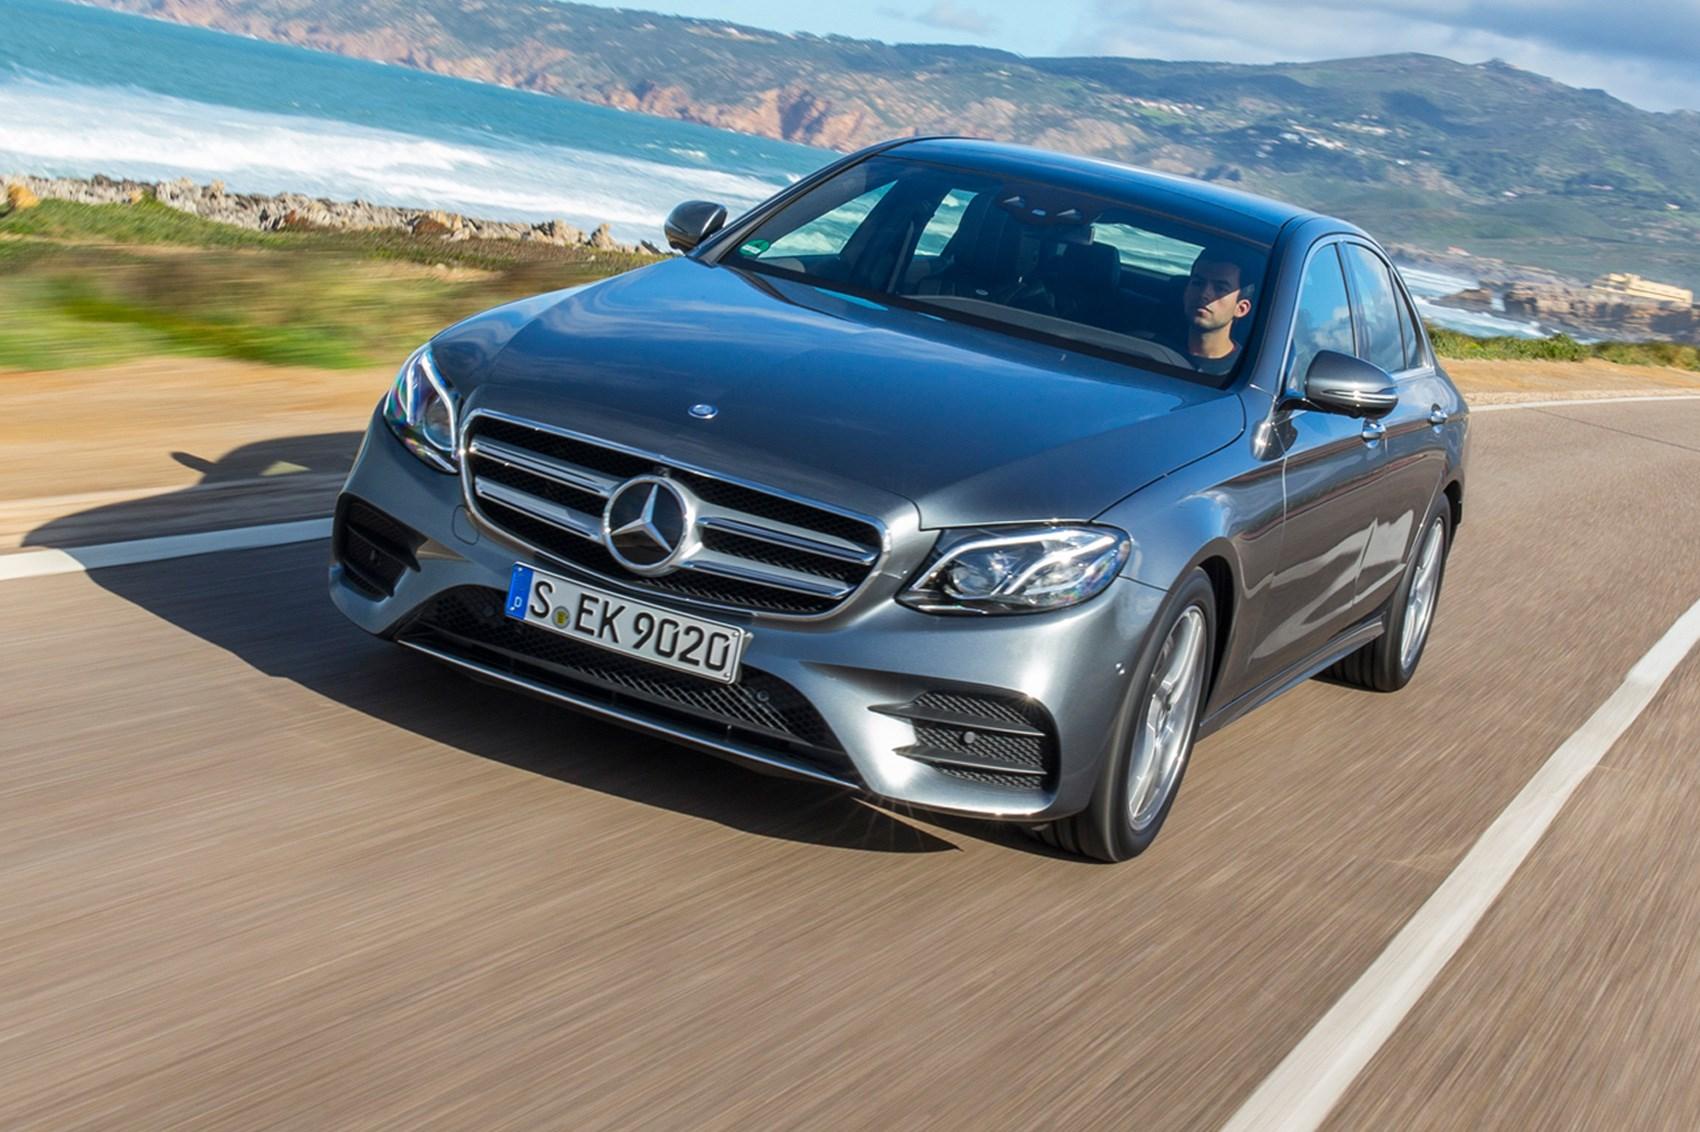 Mercedes E220d 2016 Review